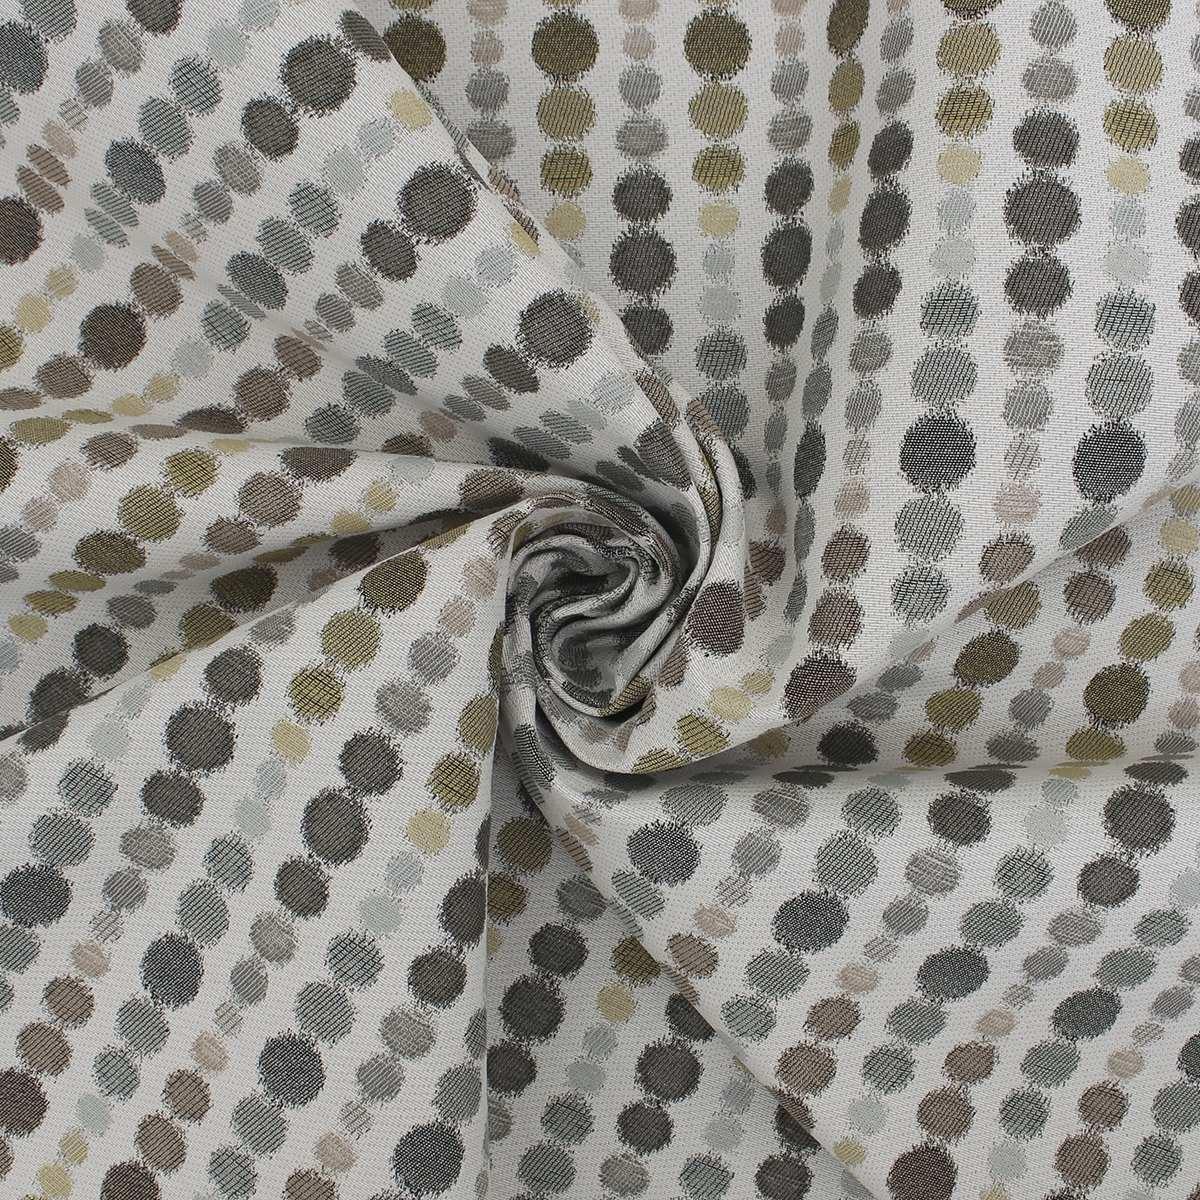 Carlotta Woven Circle Polka Motif Jacquard Upholstery Curtain Fabric 8.5m Roll